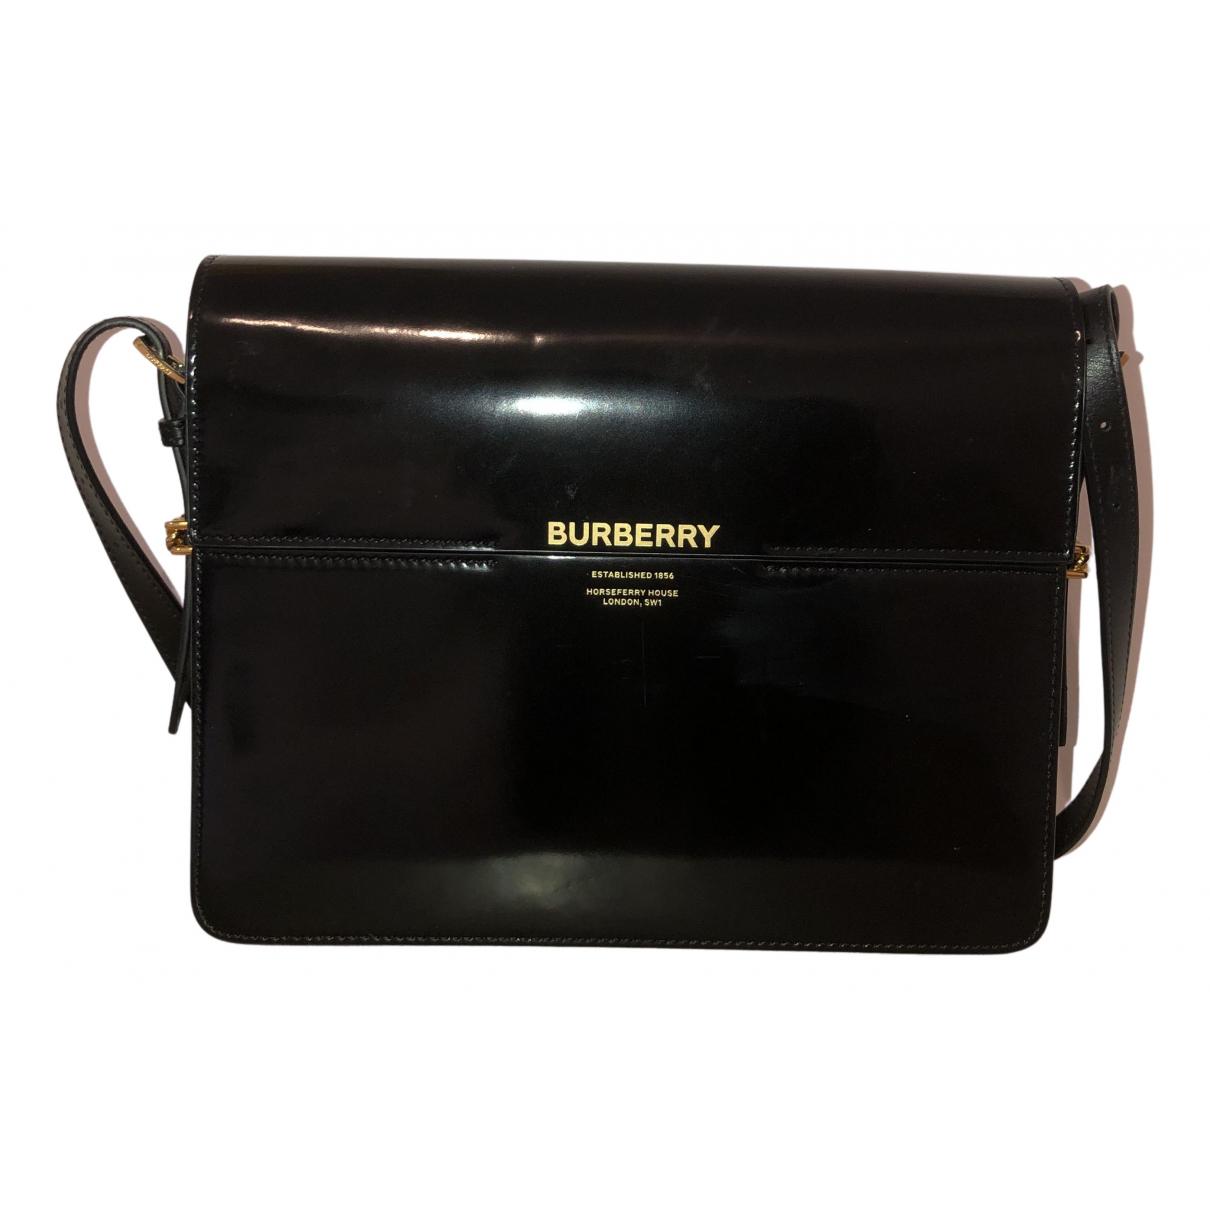 Burberry \N Handtasche in  Schwarz Lackleder